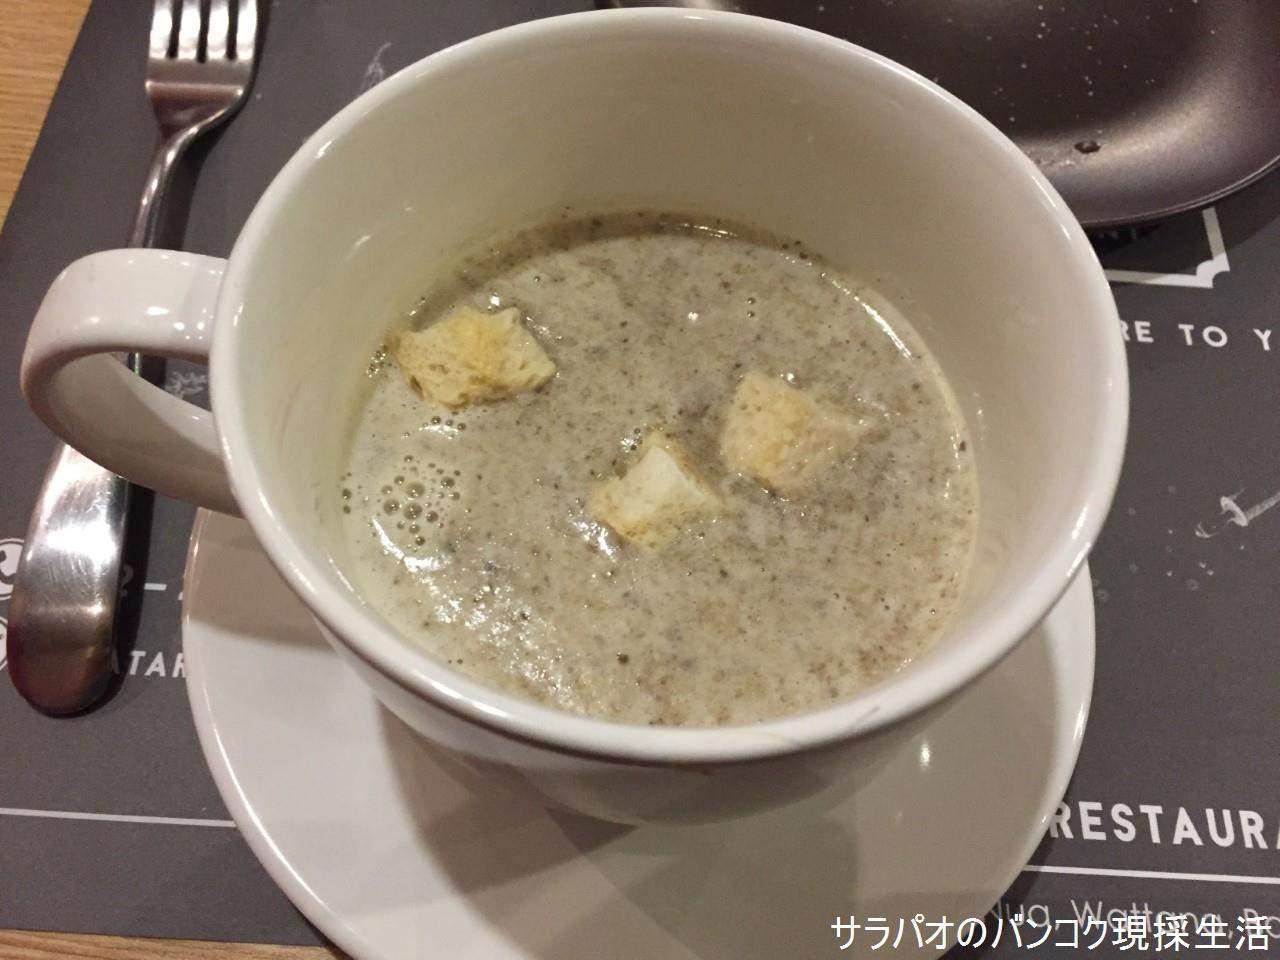 Wata_16.jpg